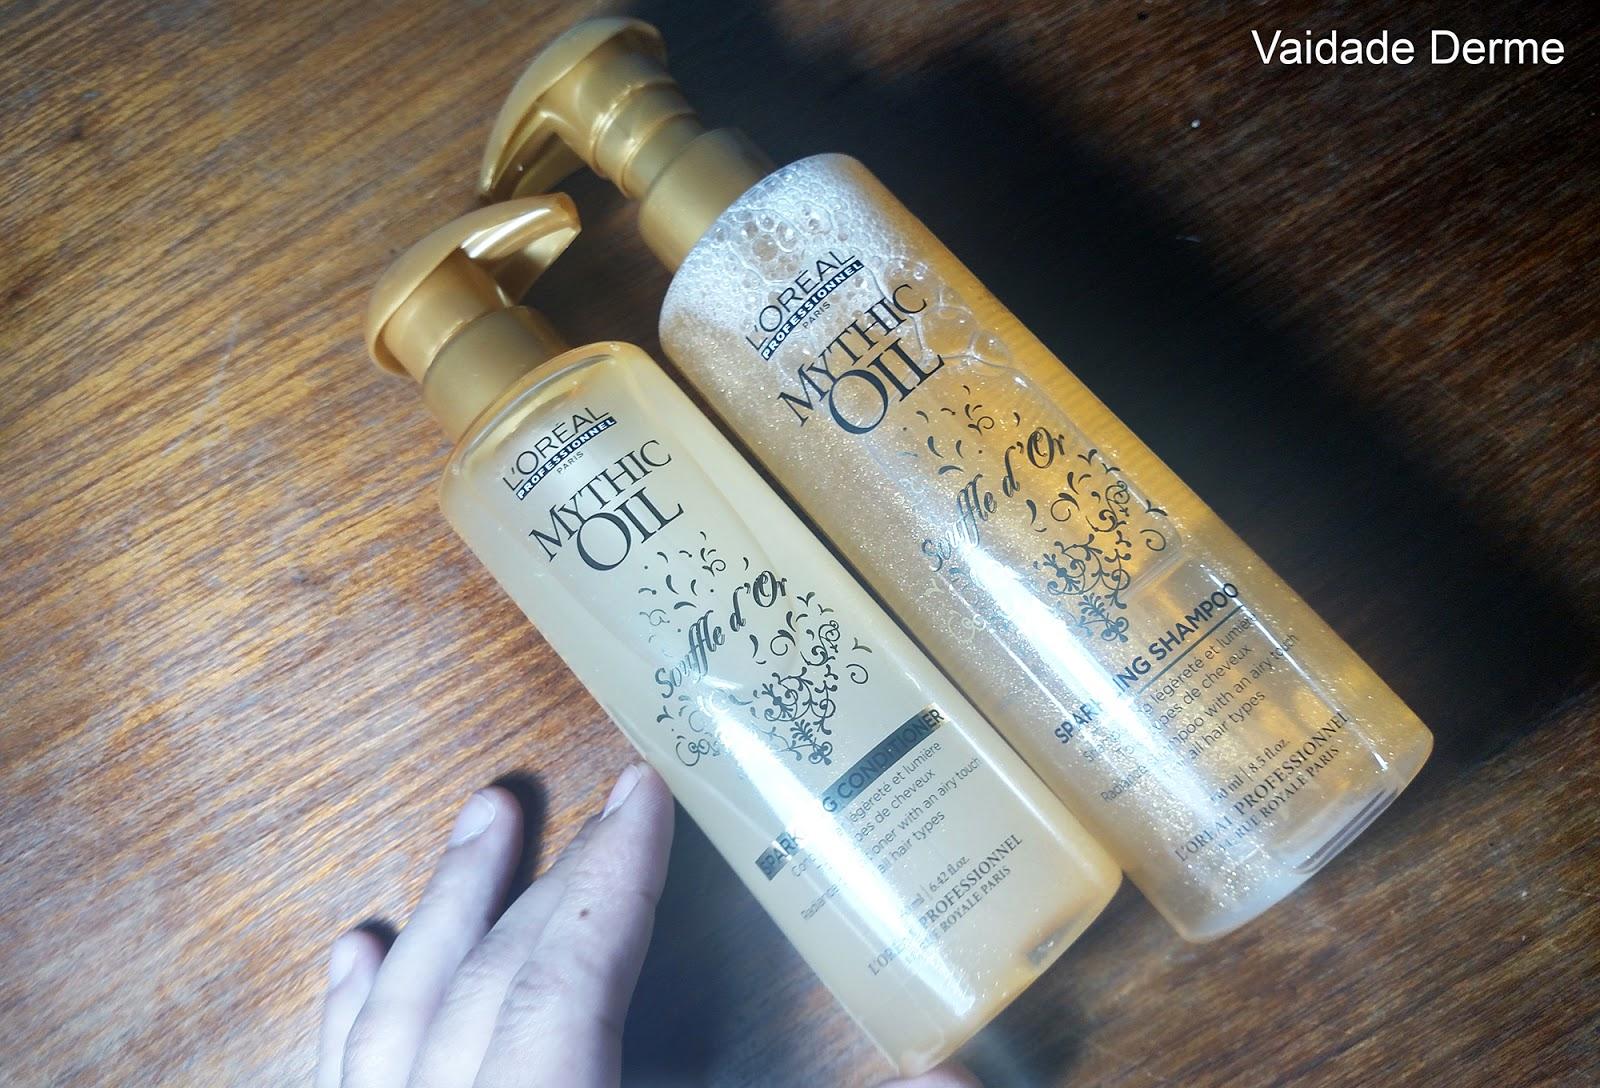 Loreal Profissional Mythic Oil Souffle D'or Shampoo e Condicionador